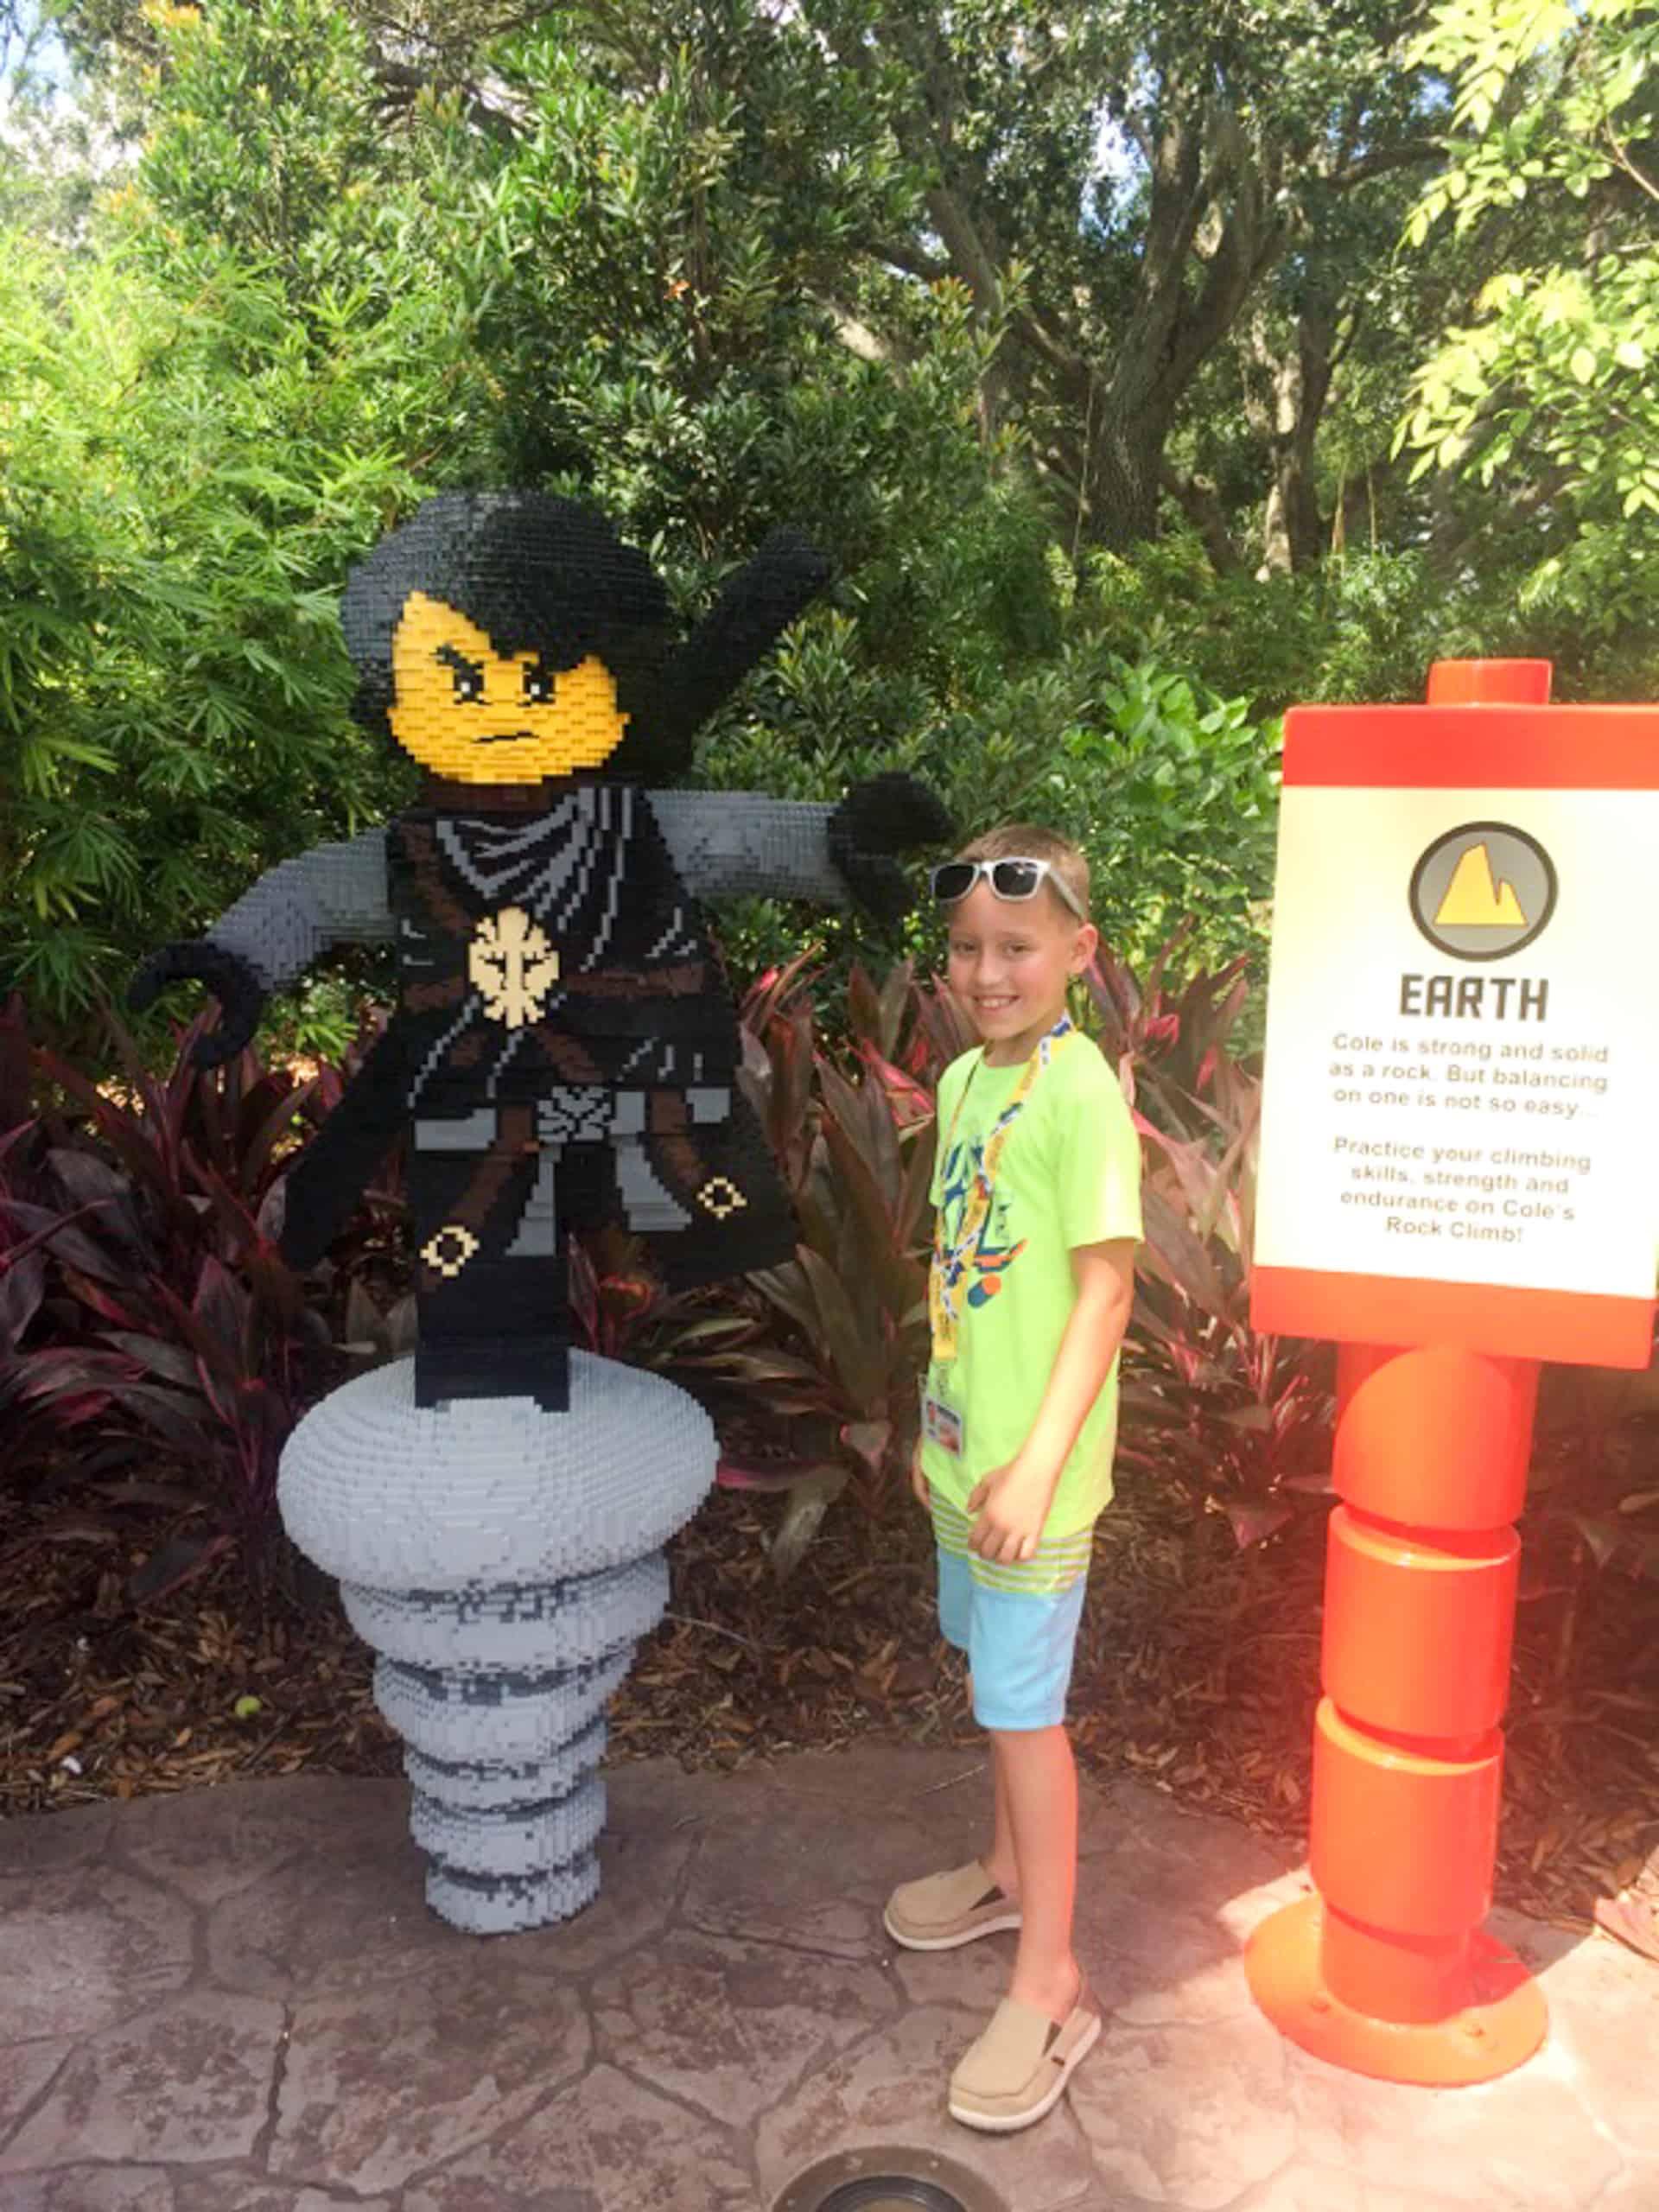 Legoland Florida Cole lego sculpture